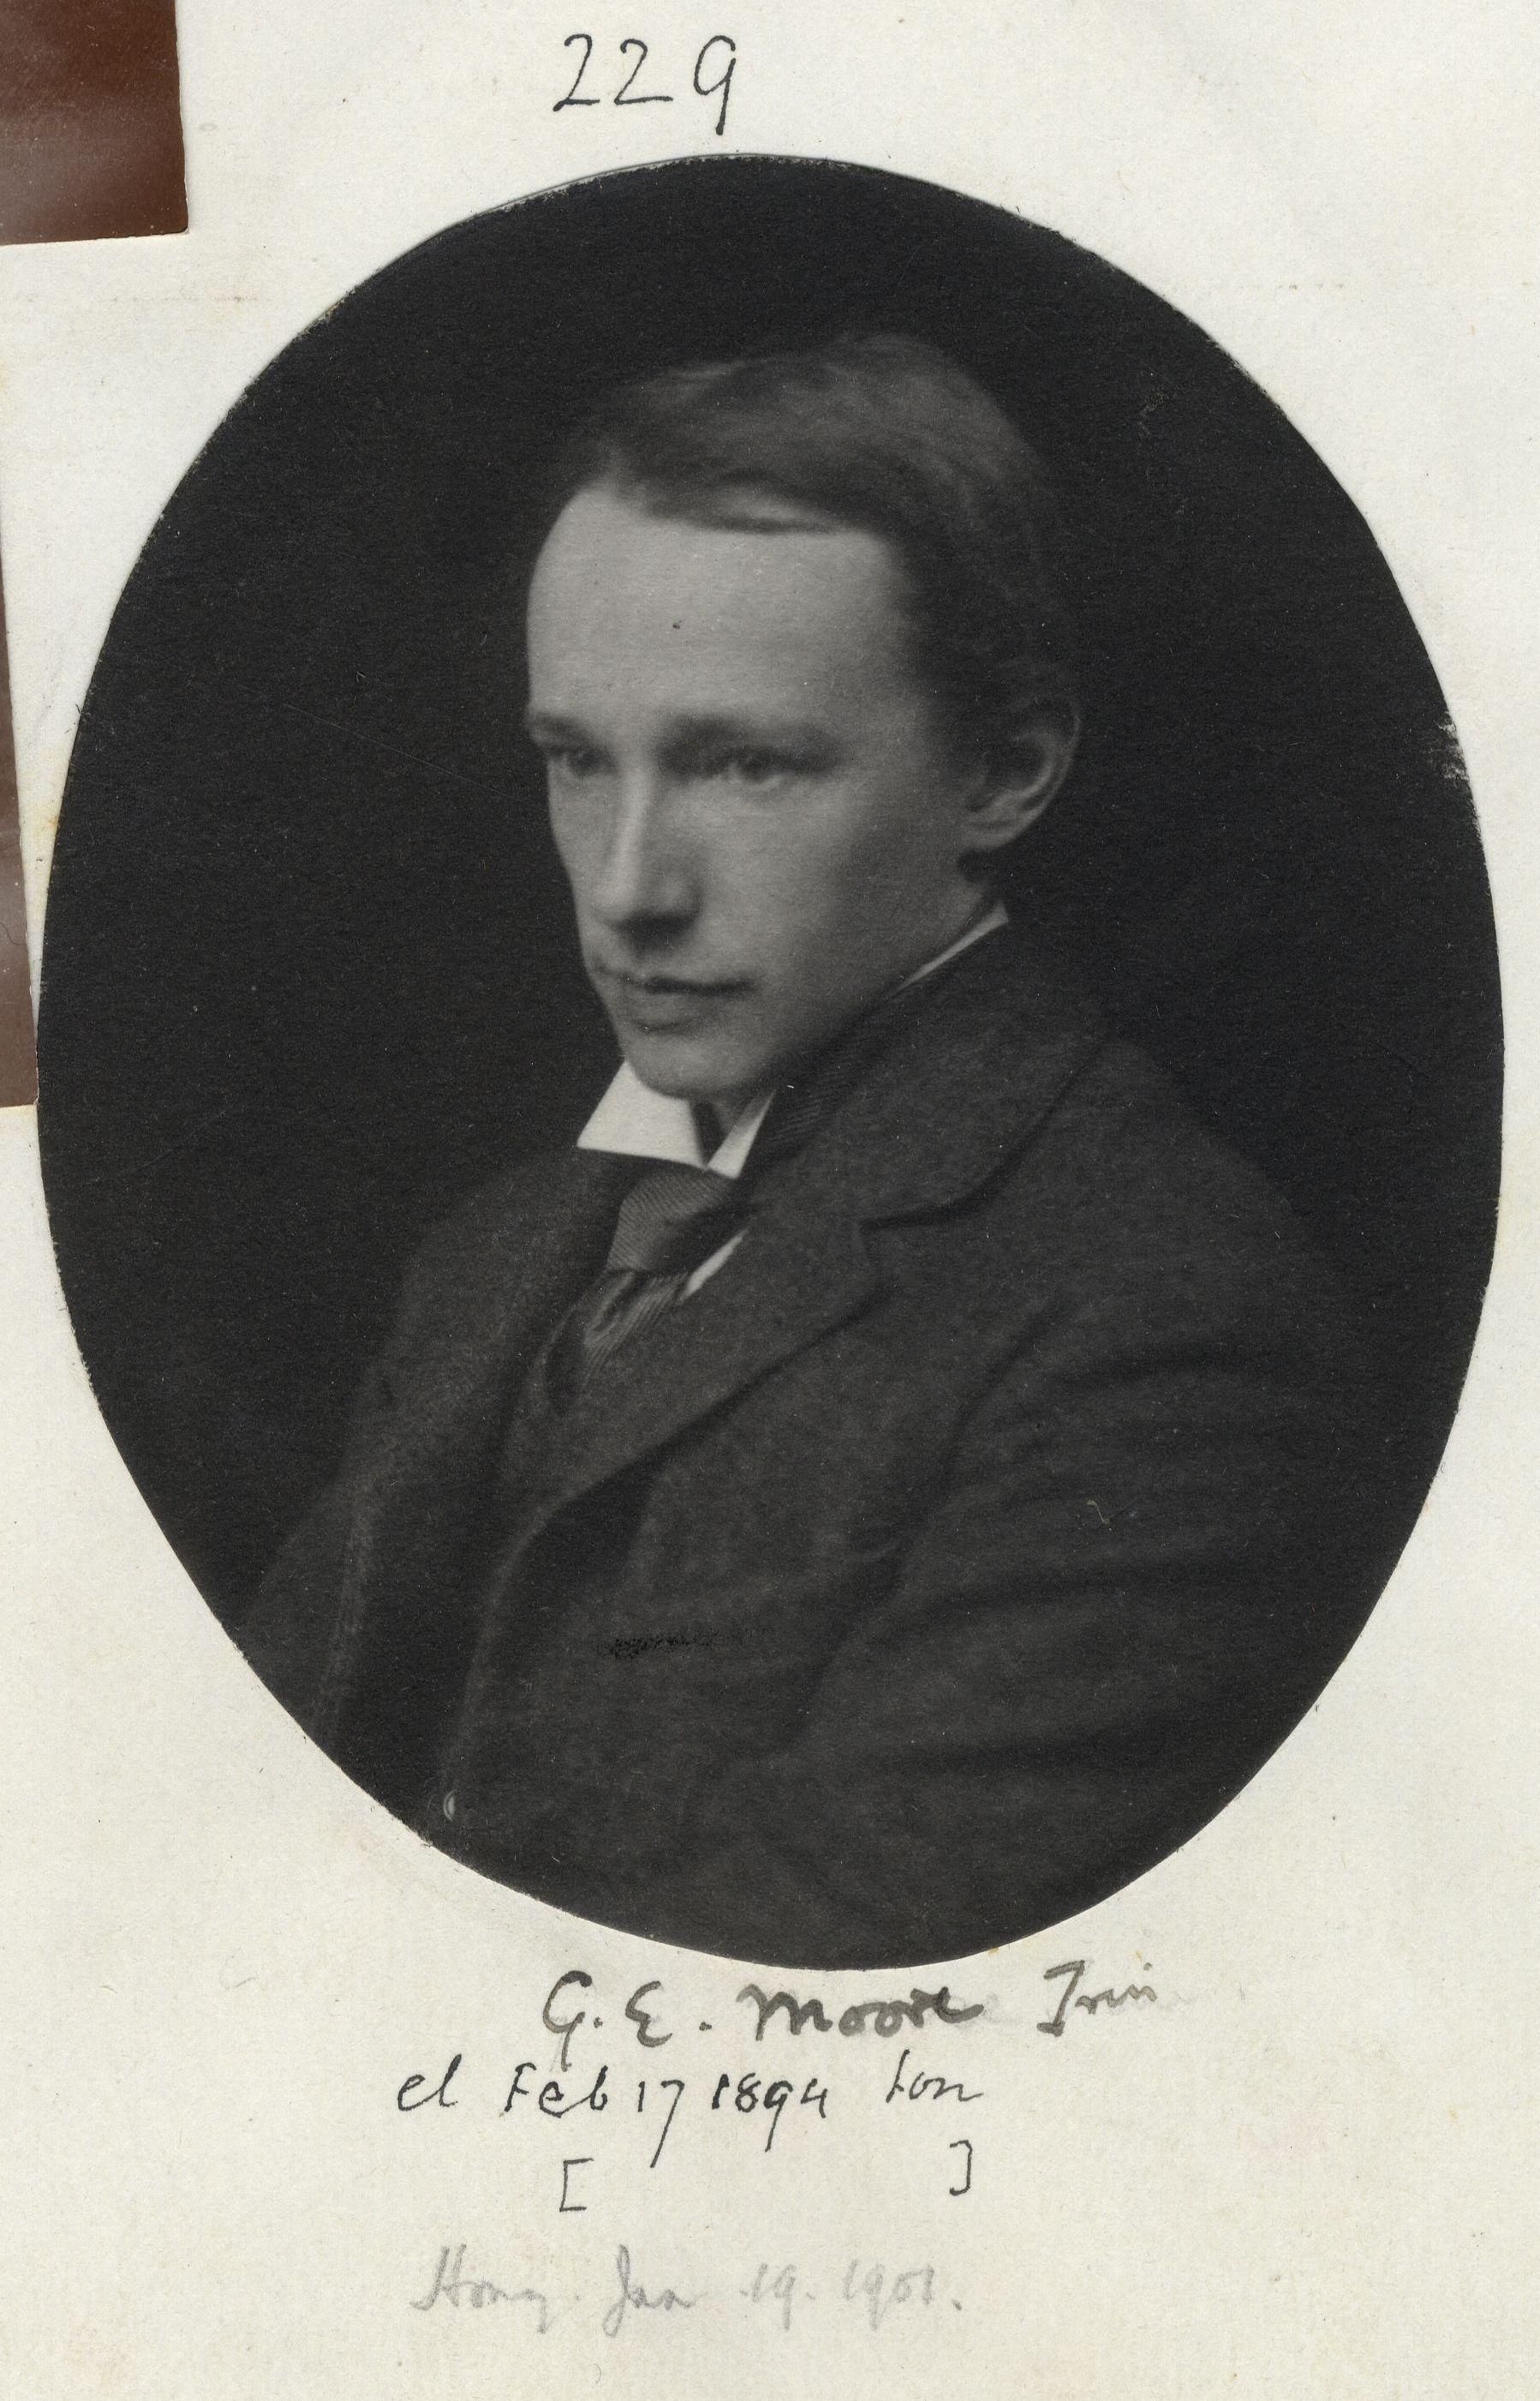 229: Moore, George Edward.  [KCAS/39/4/1, Photobook, p.70]